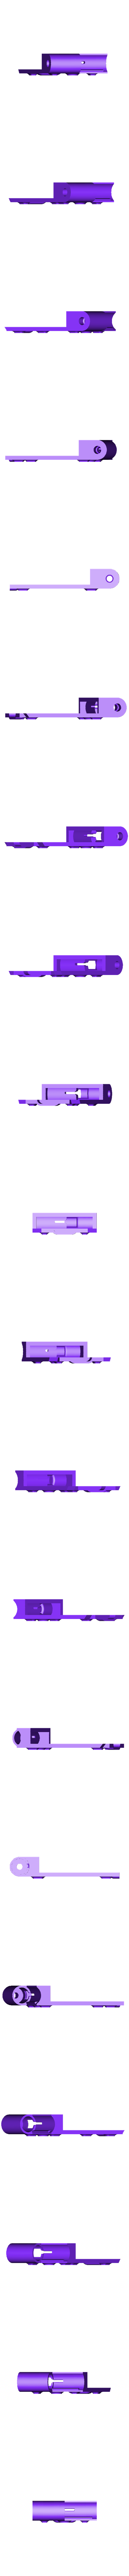 BASE_BODY.stl Télécharger fichier STL gratuit Moniteur OLED OctoPi [WemOled] • Plan imprimable en 3D, theveel